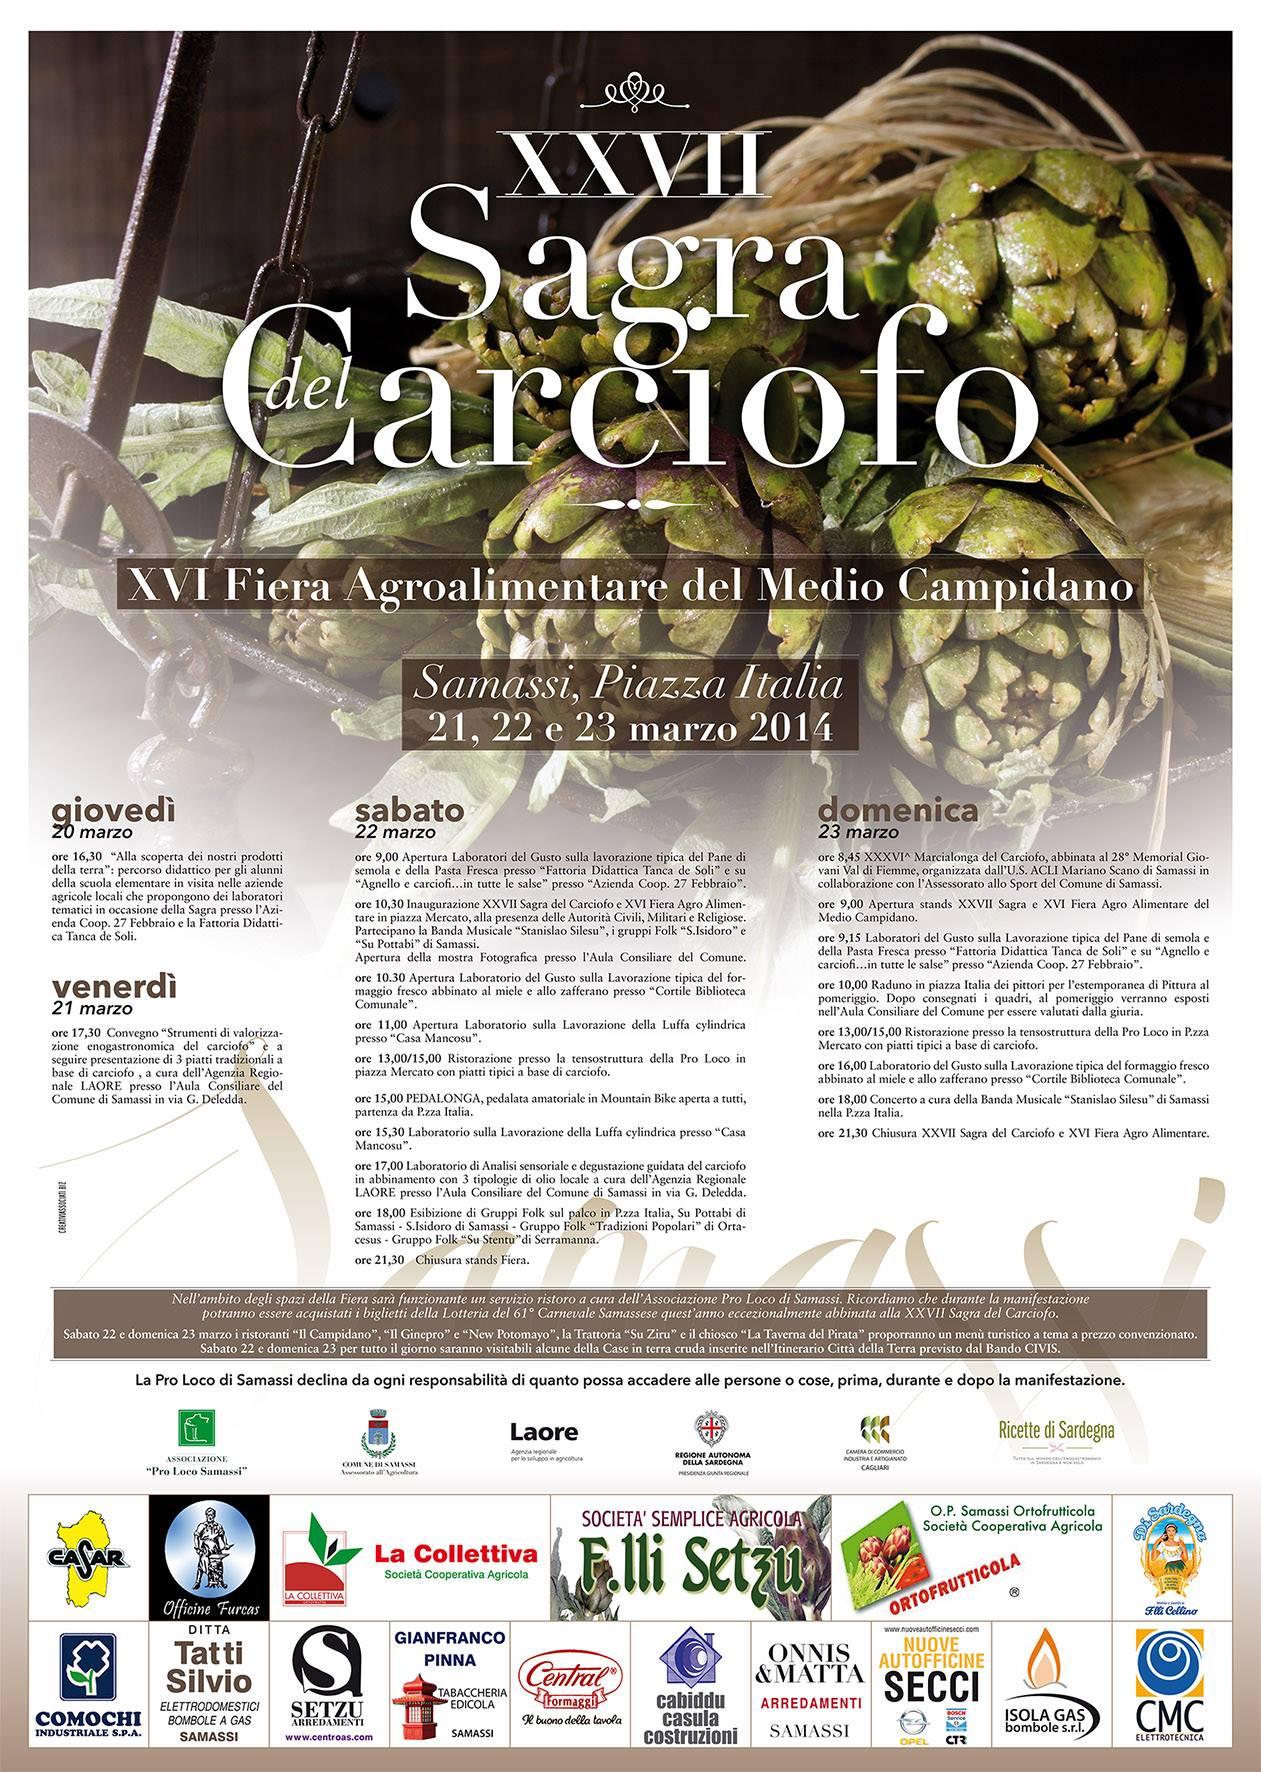 Sagra del carciofo 21 22 23 marzo 2014 a Samassi Sardegna